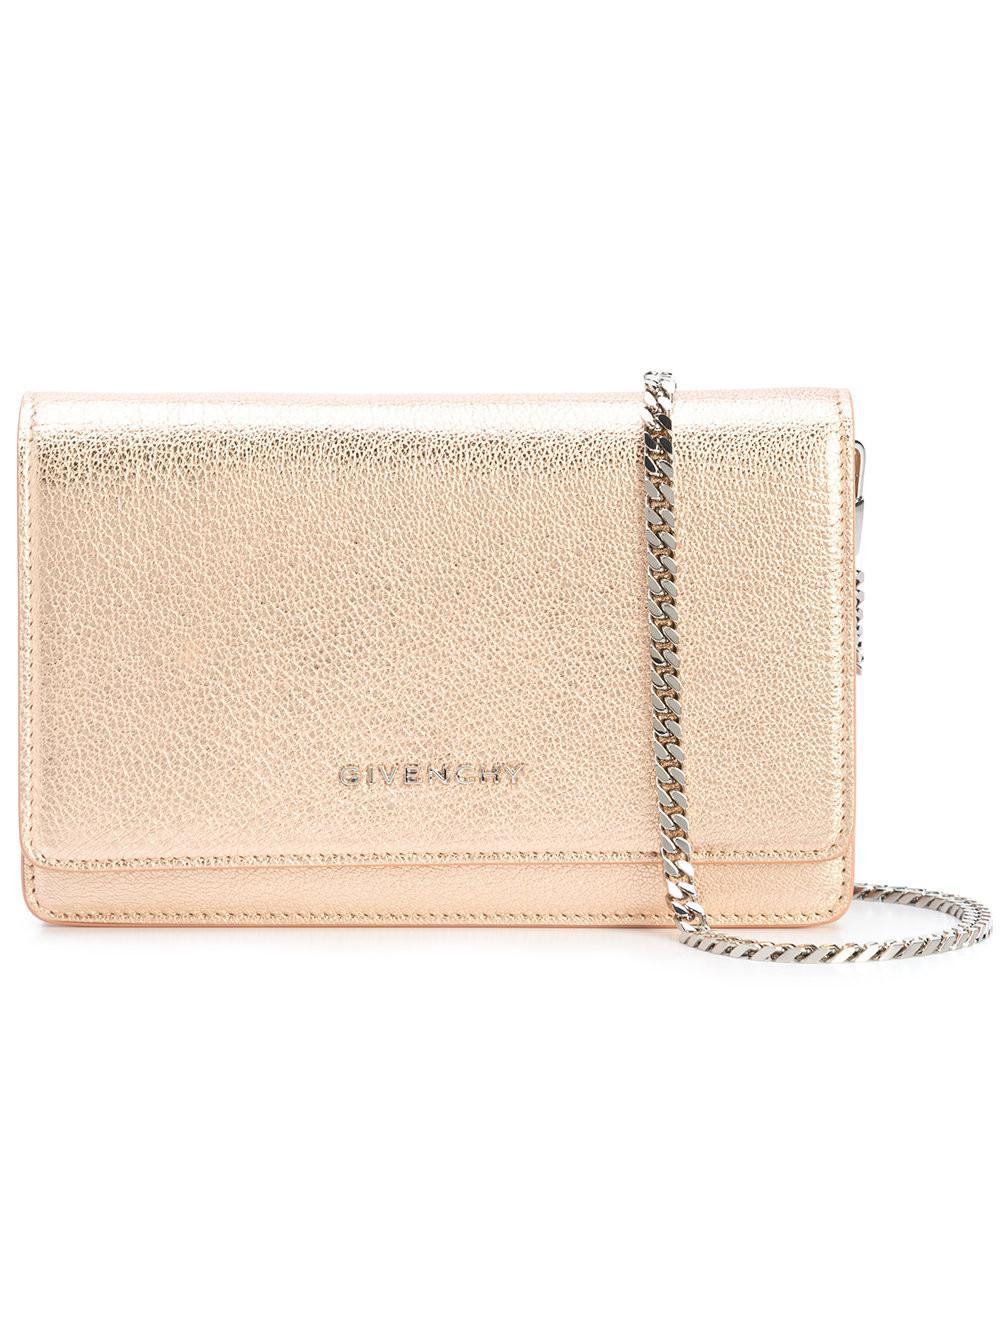 Pandora mini chain wallet - Metallic Givenchy JJxlEb